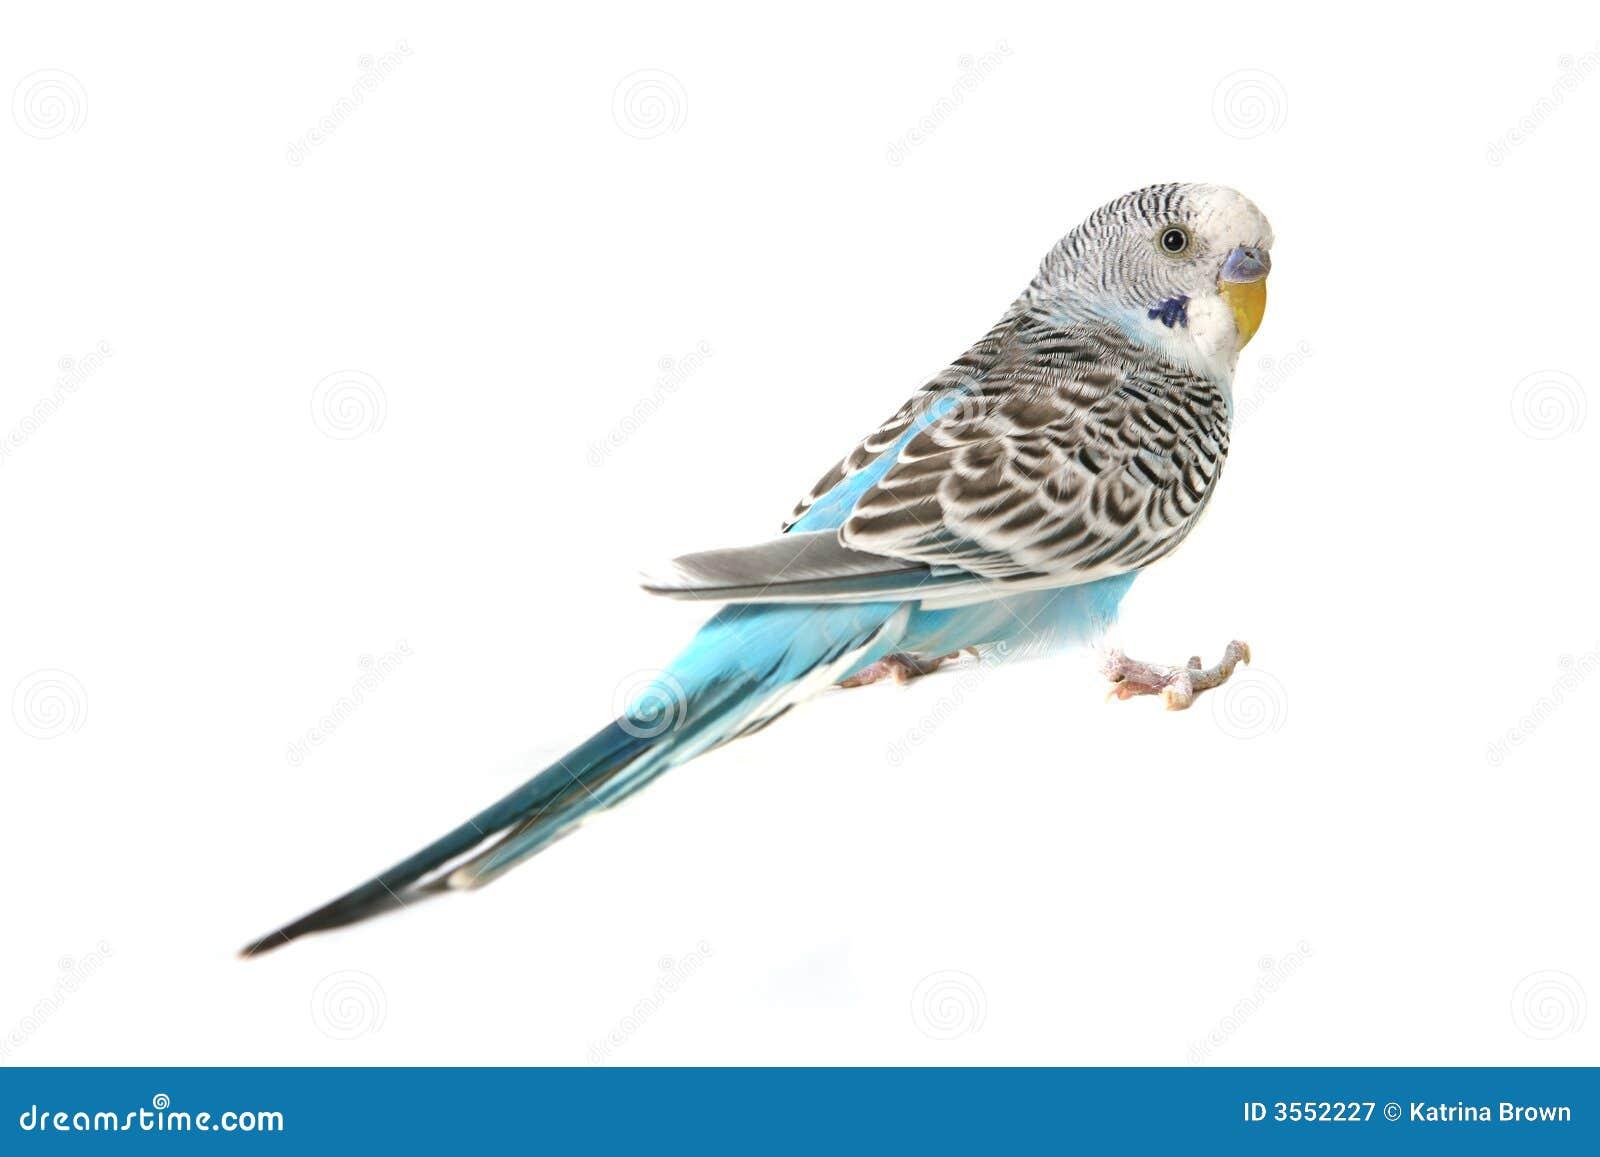 Blue Budgie Parakeet Bird Royalty Free Stock Photography - Image ...